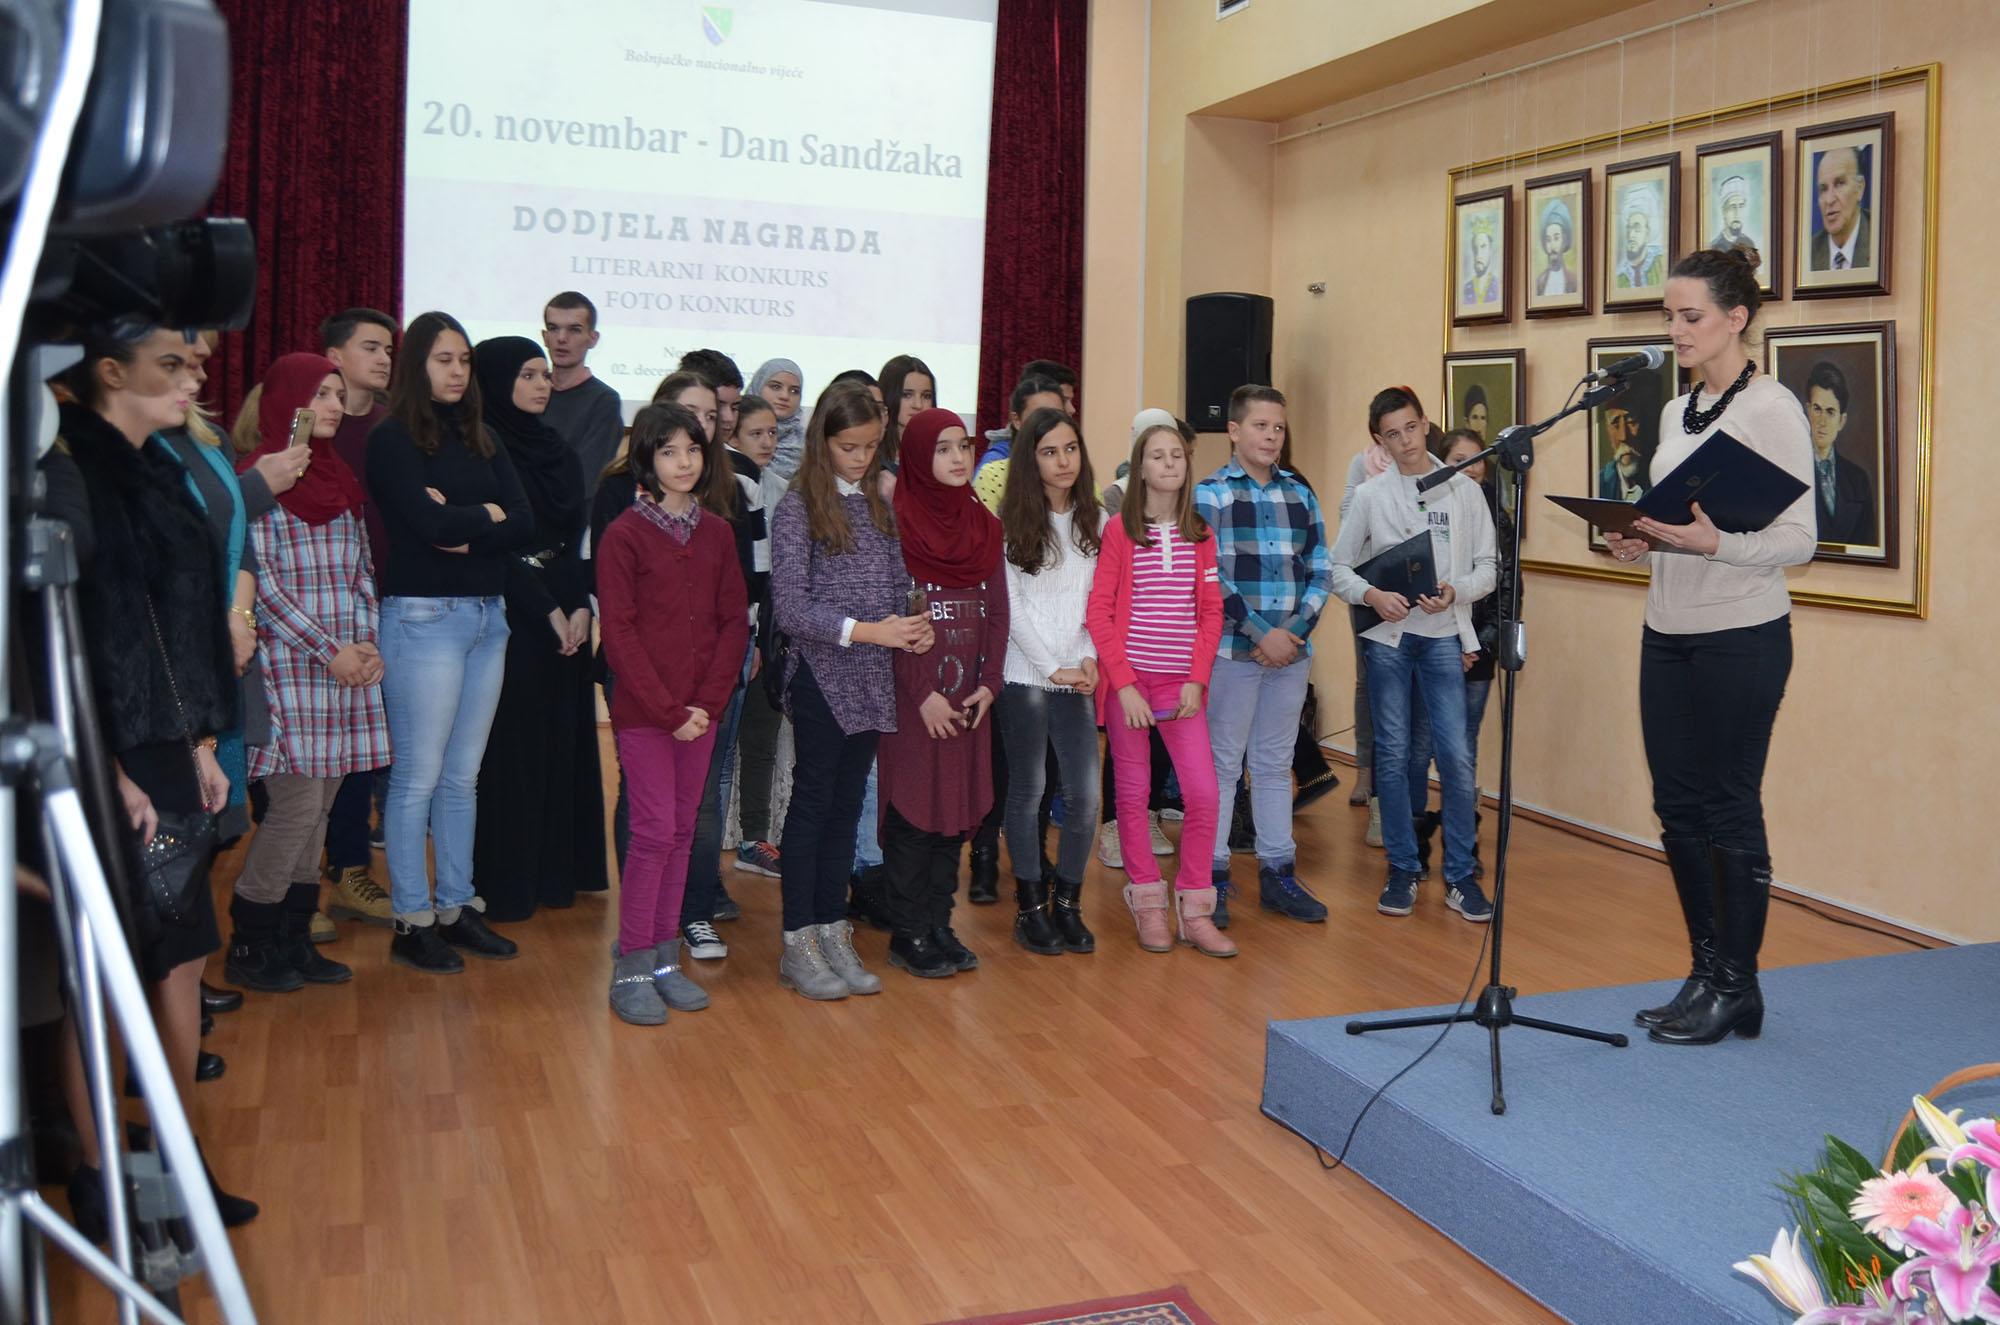 2016-12-02-dodjela-nagrada-konkursi-dan-sandzaka-3